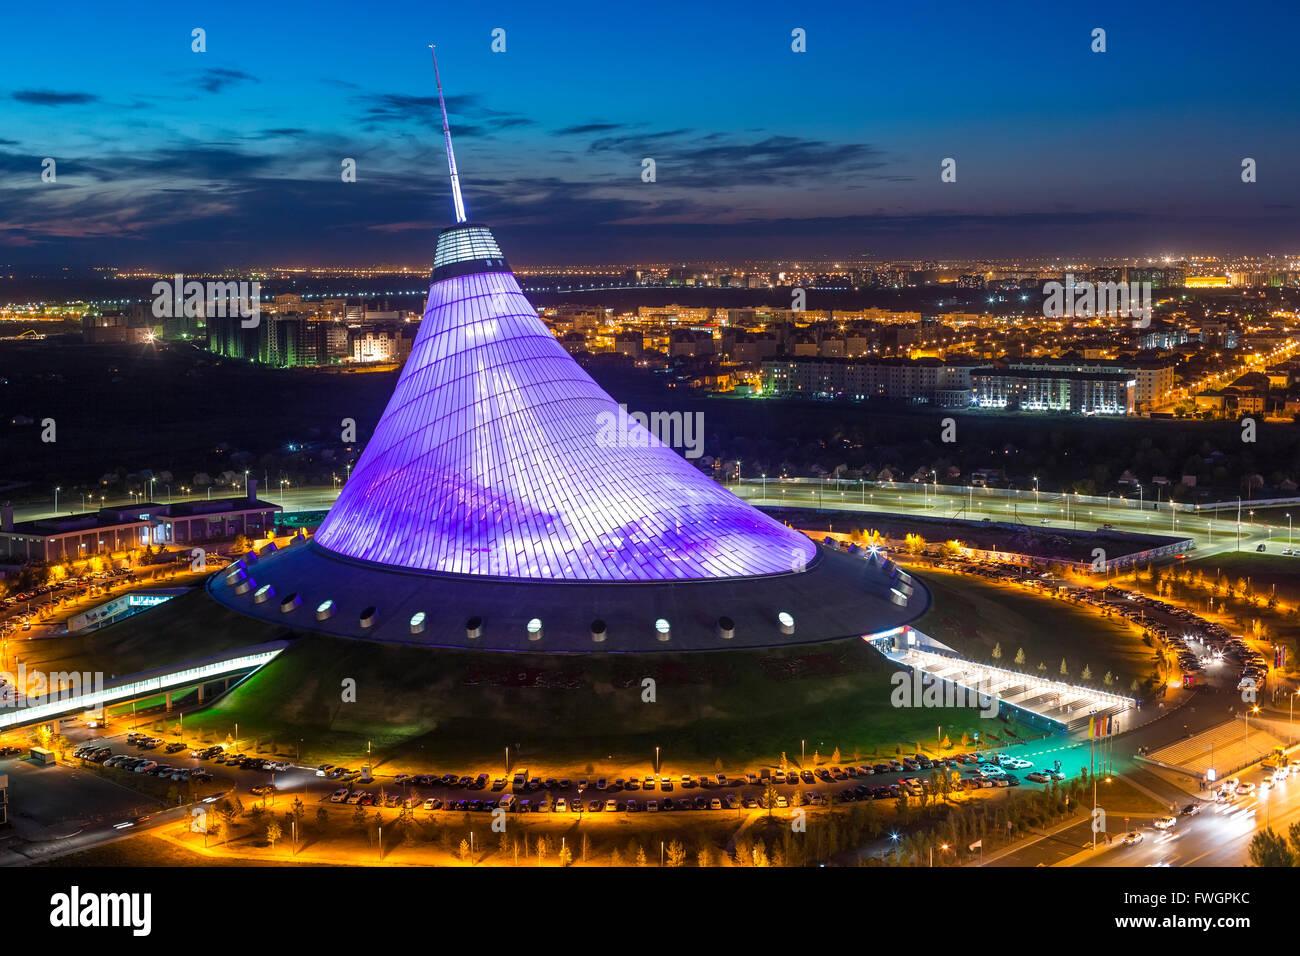 Vista notturna su Khan Shatyr entertainment center, Astana, Kazakistan, Asia centrale Immagini Stock